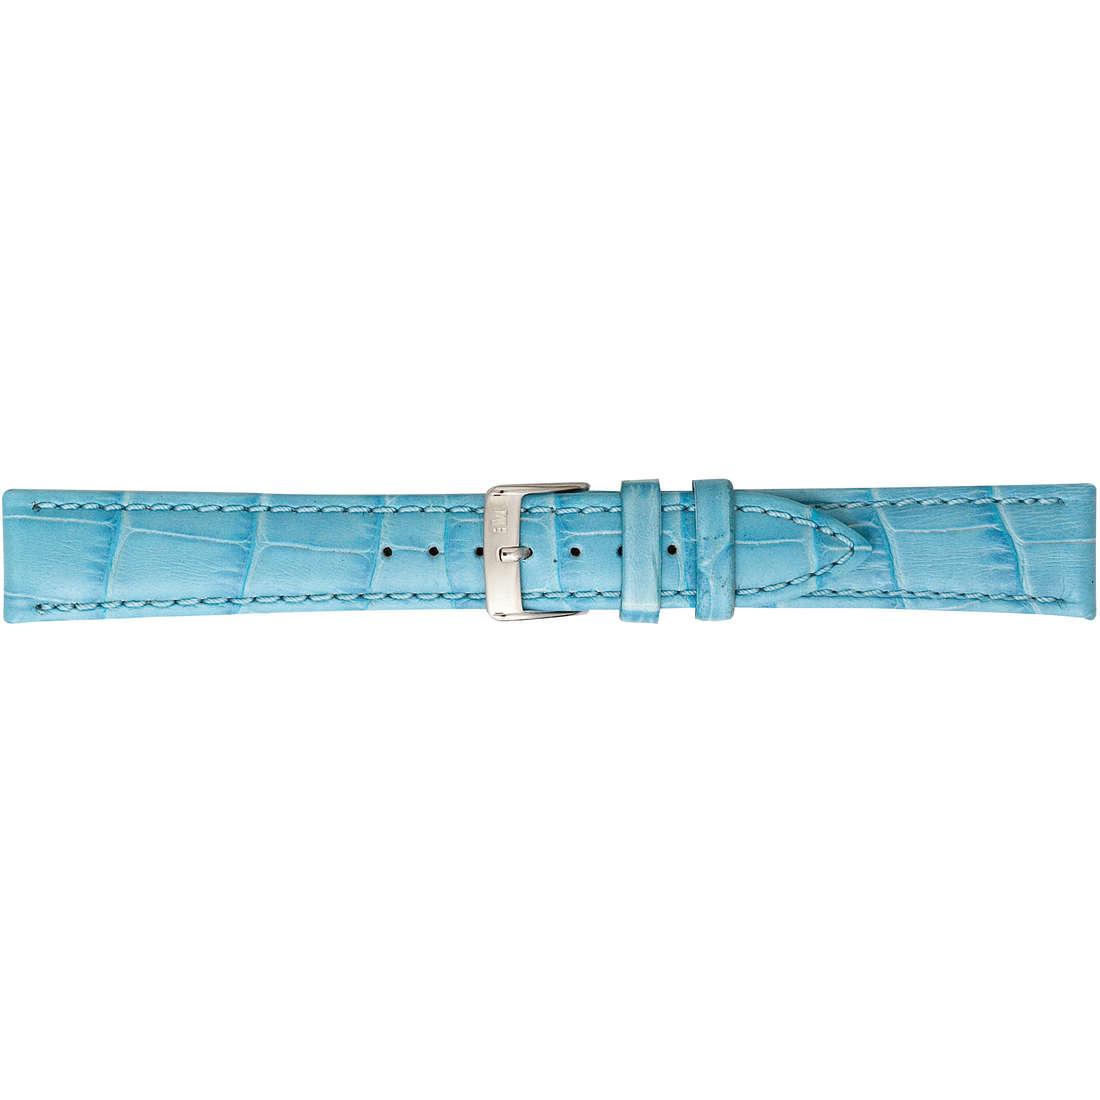 watch watch bands watch straps man Morellato Morellato 1930 A01X2269480168CR16